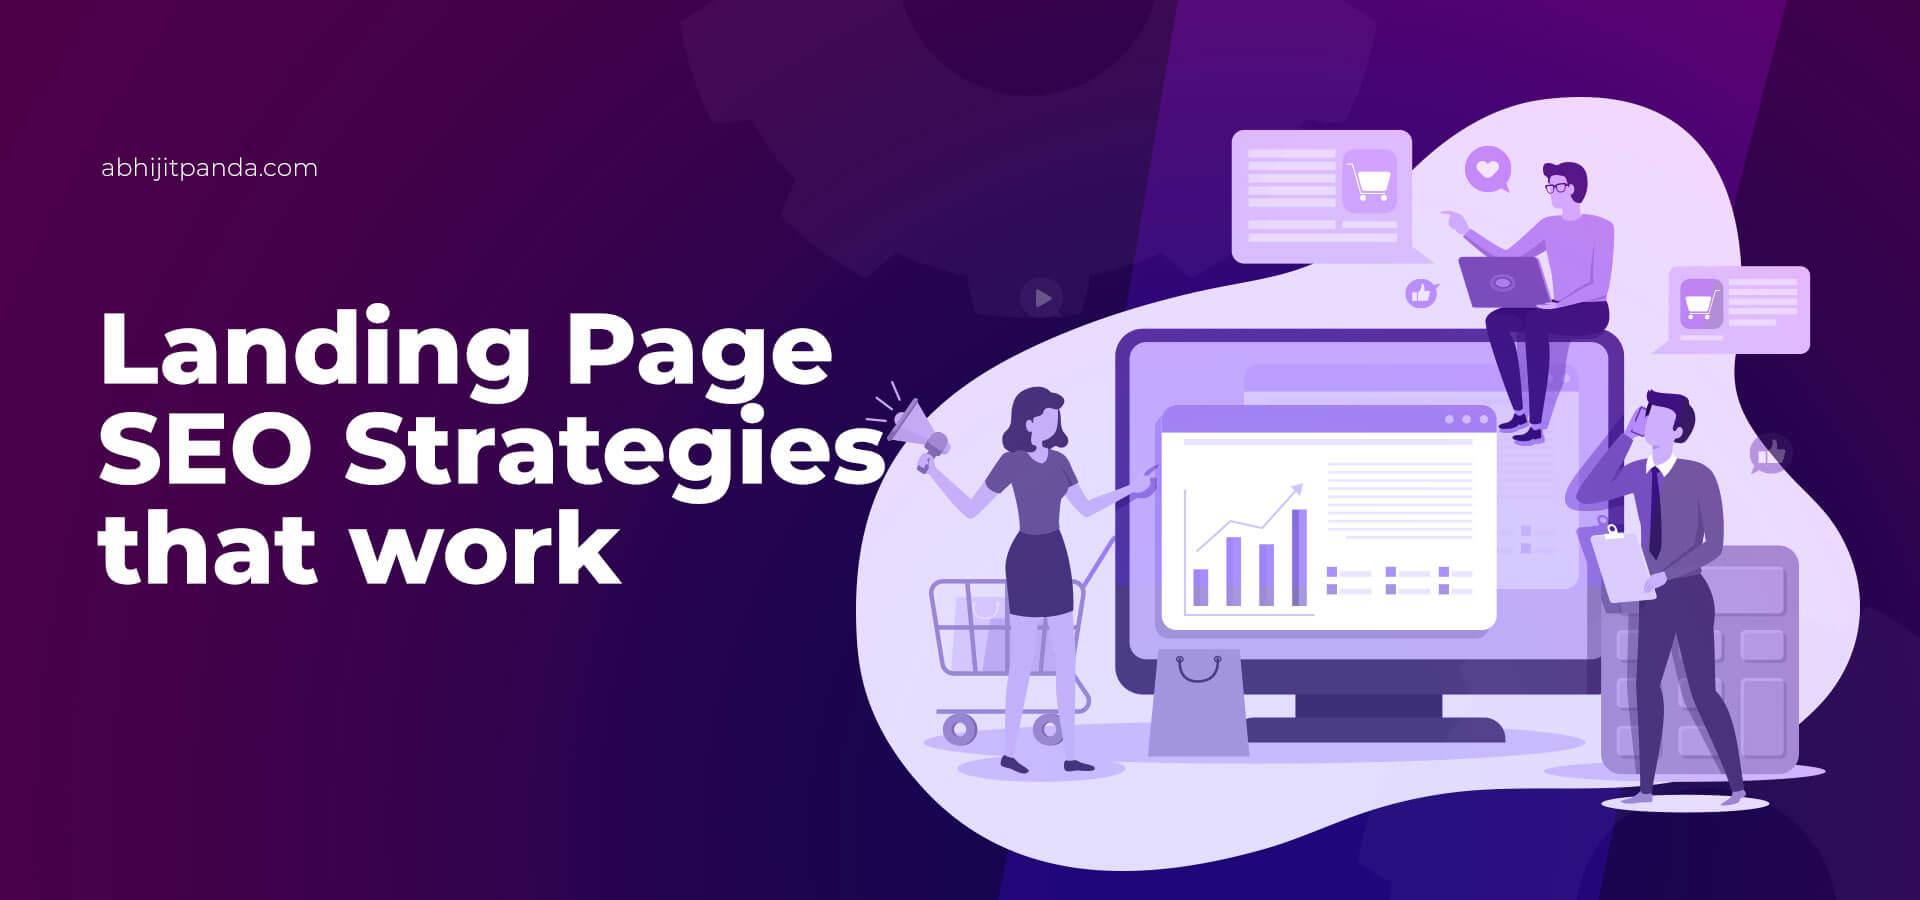 Landing Page SEO Strategies